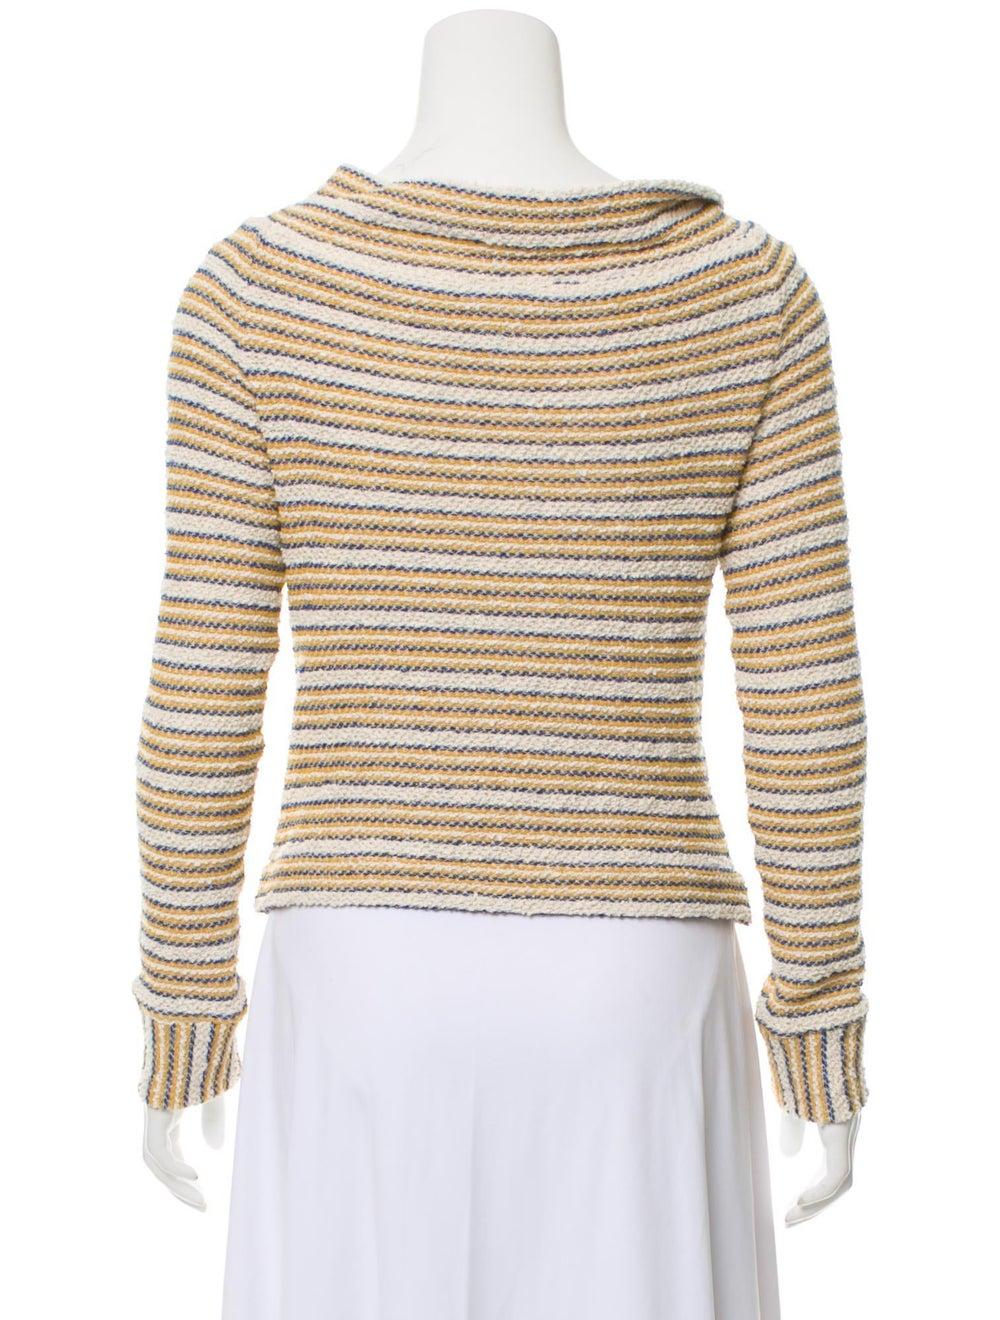 Iro Striped Tweed Jacket - image 3